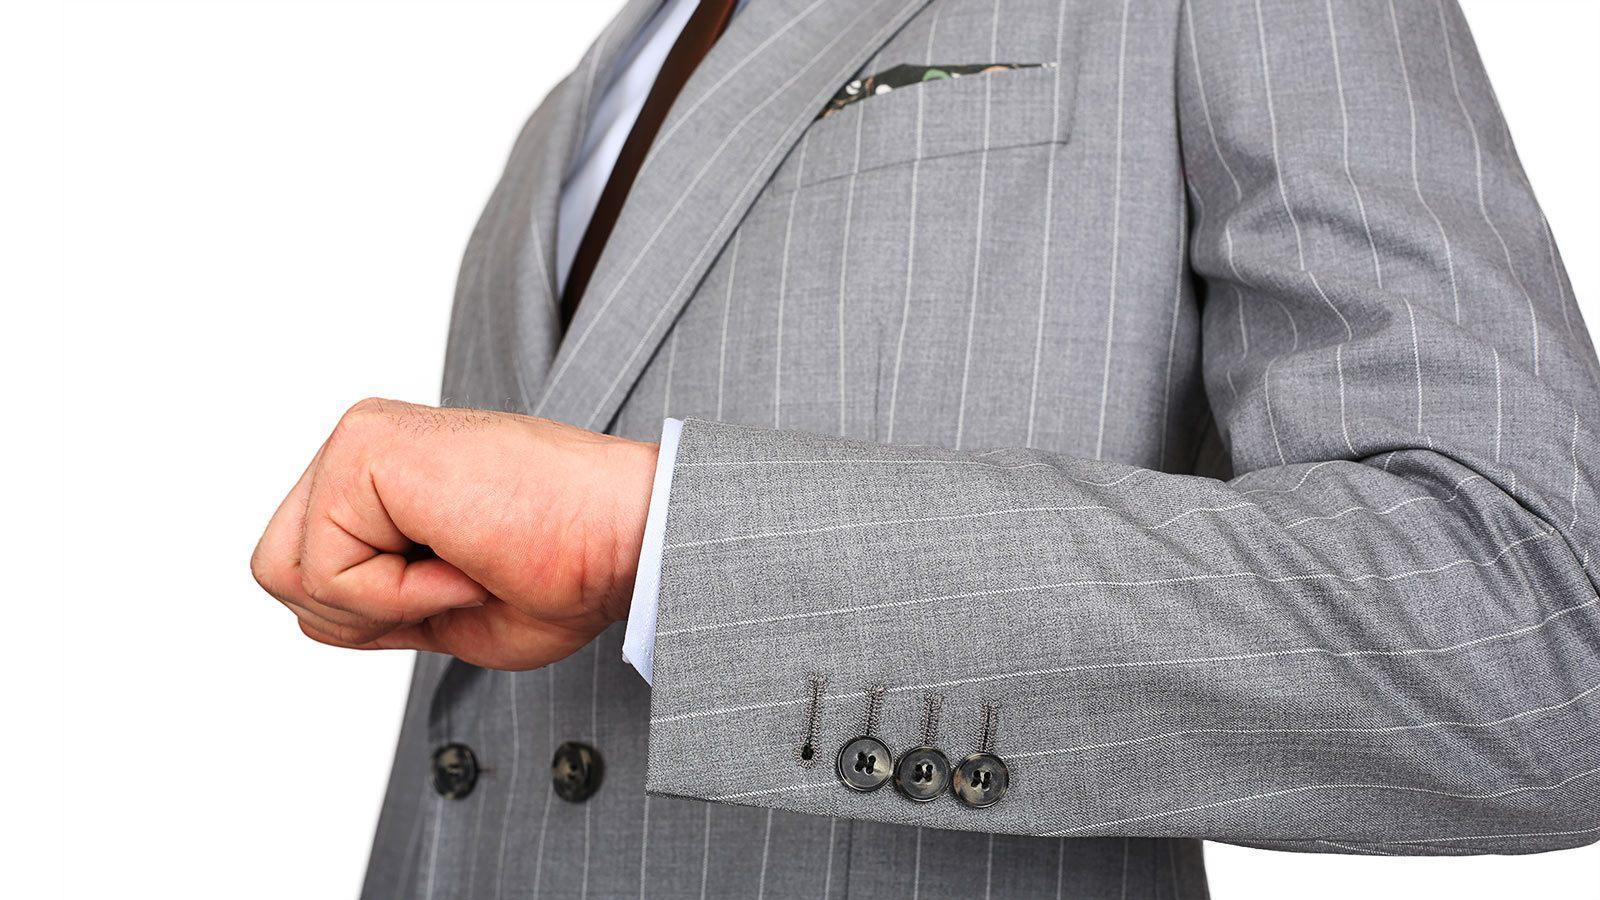 Premium Light Grey Chalkstripe 150s Suit - slider image 1